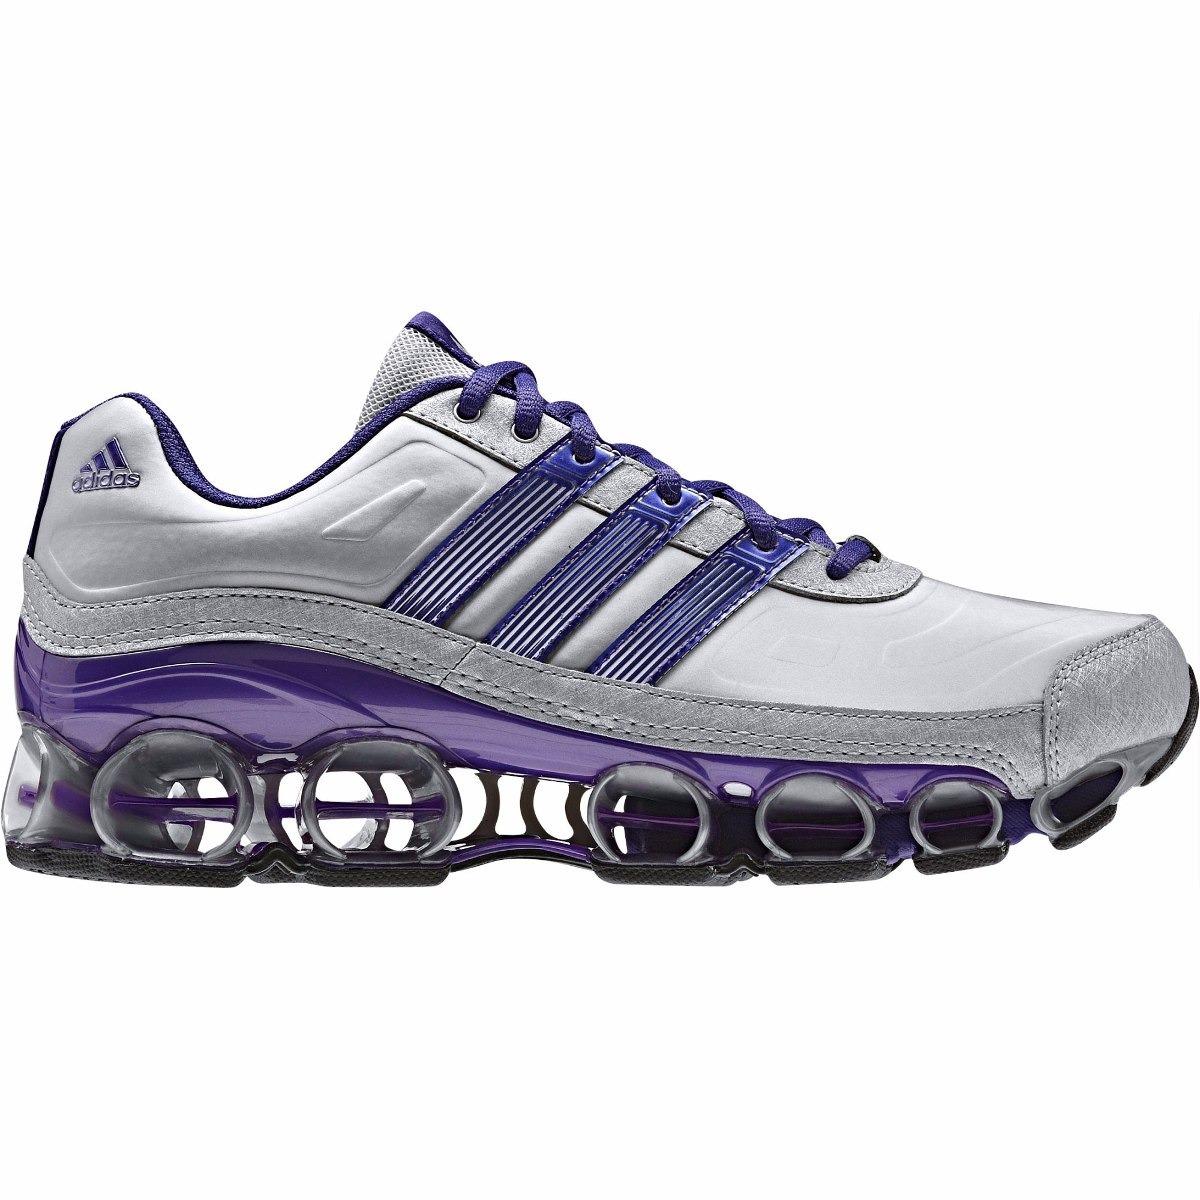 6a11733e729 Inperdibles!! Zapatillas adidas Bounce Mujer Nuevas - S  199